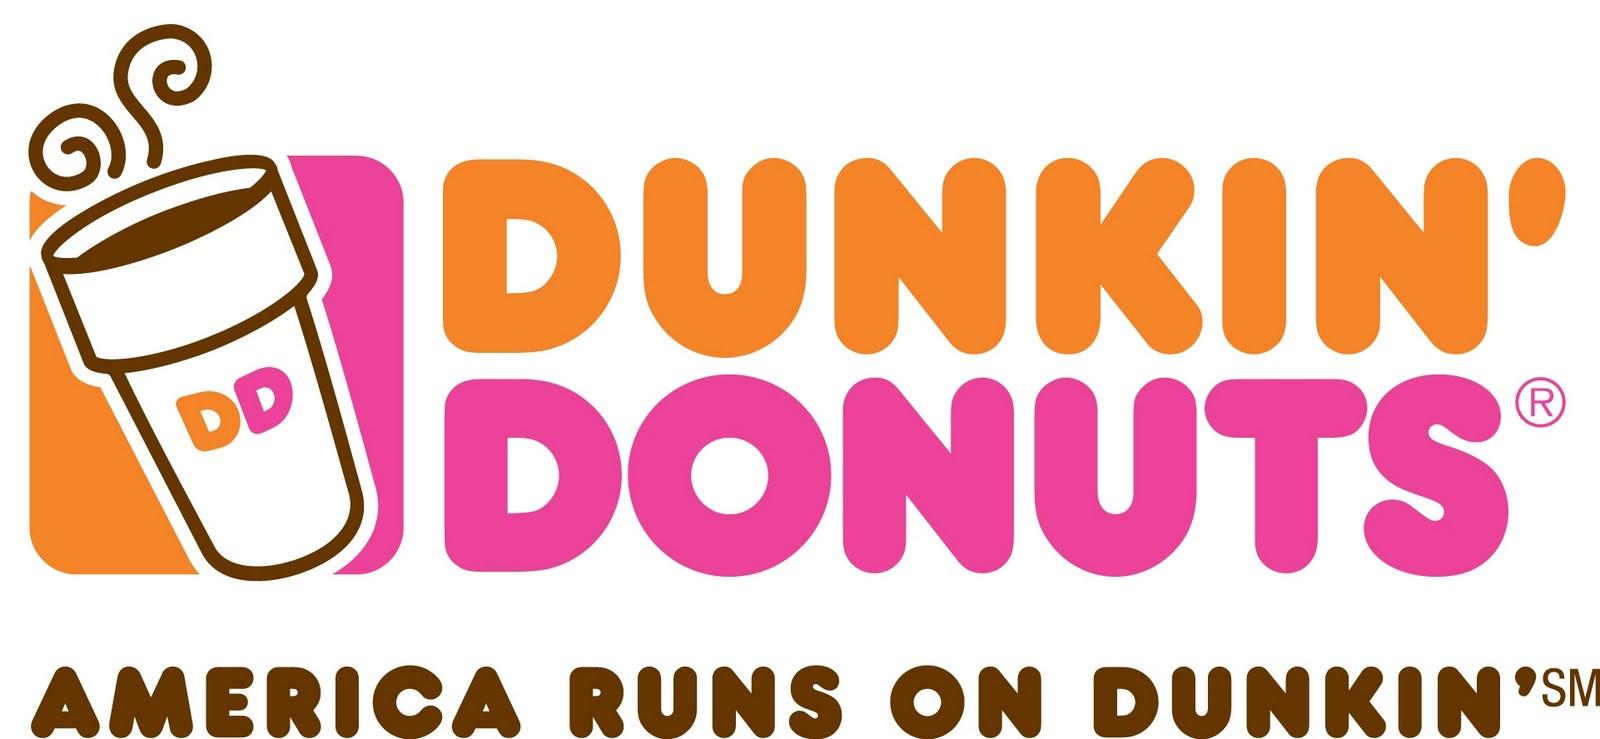 Harry Potter Fun facts: Dunkin Donuts Logo